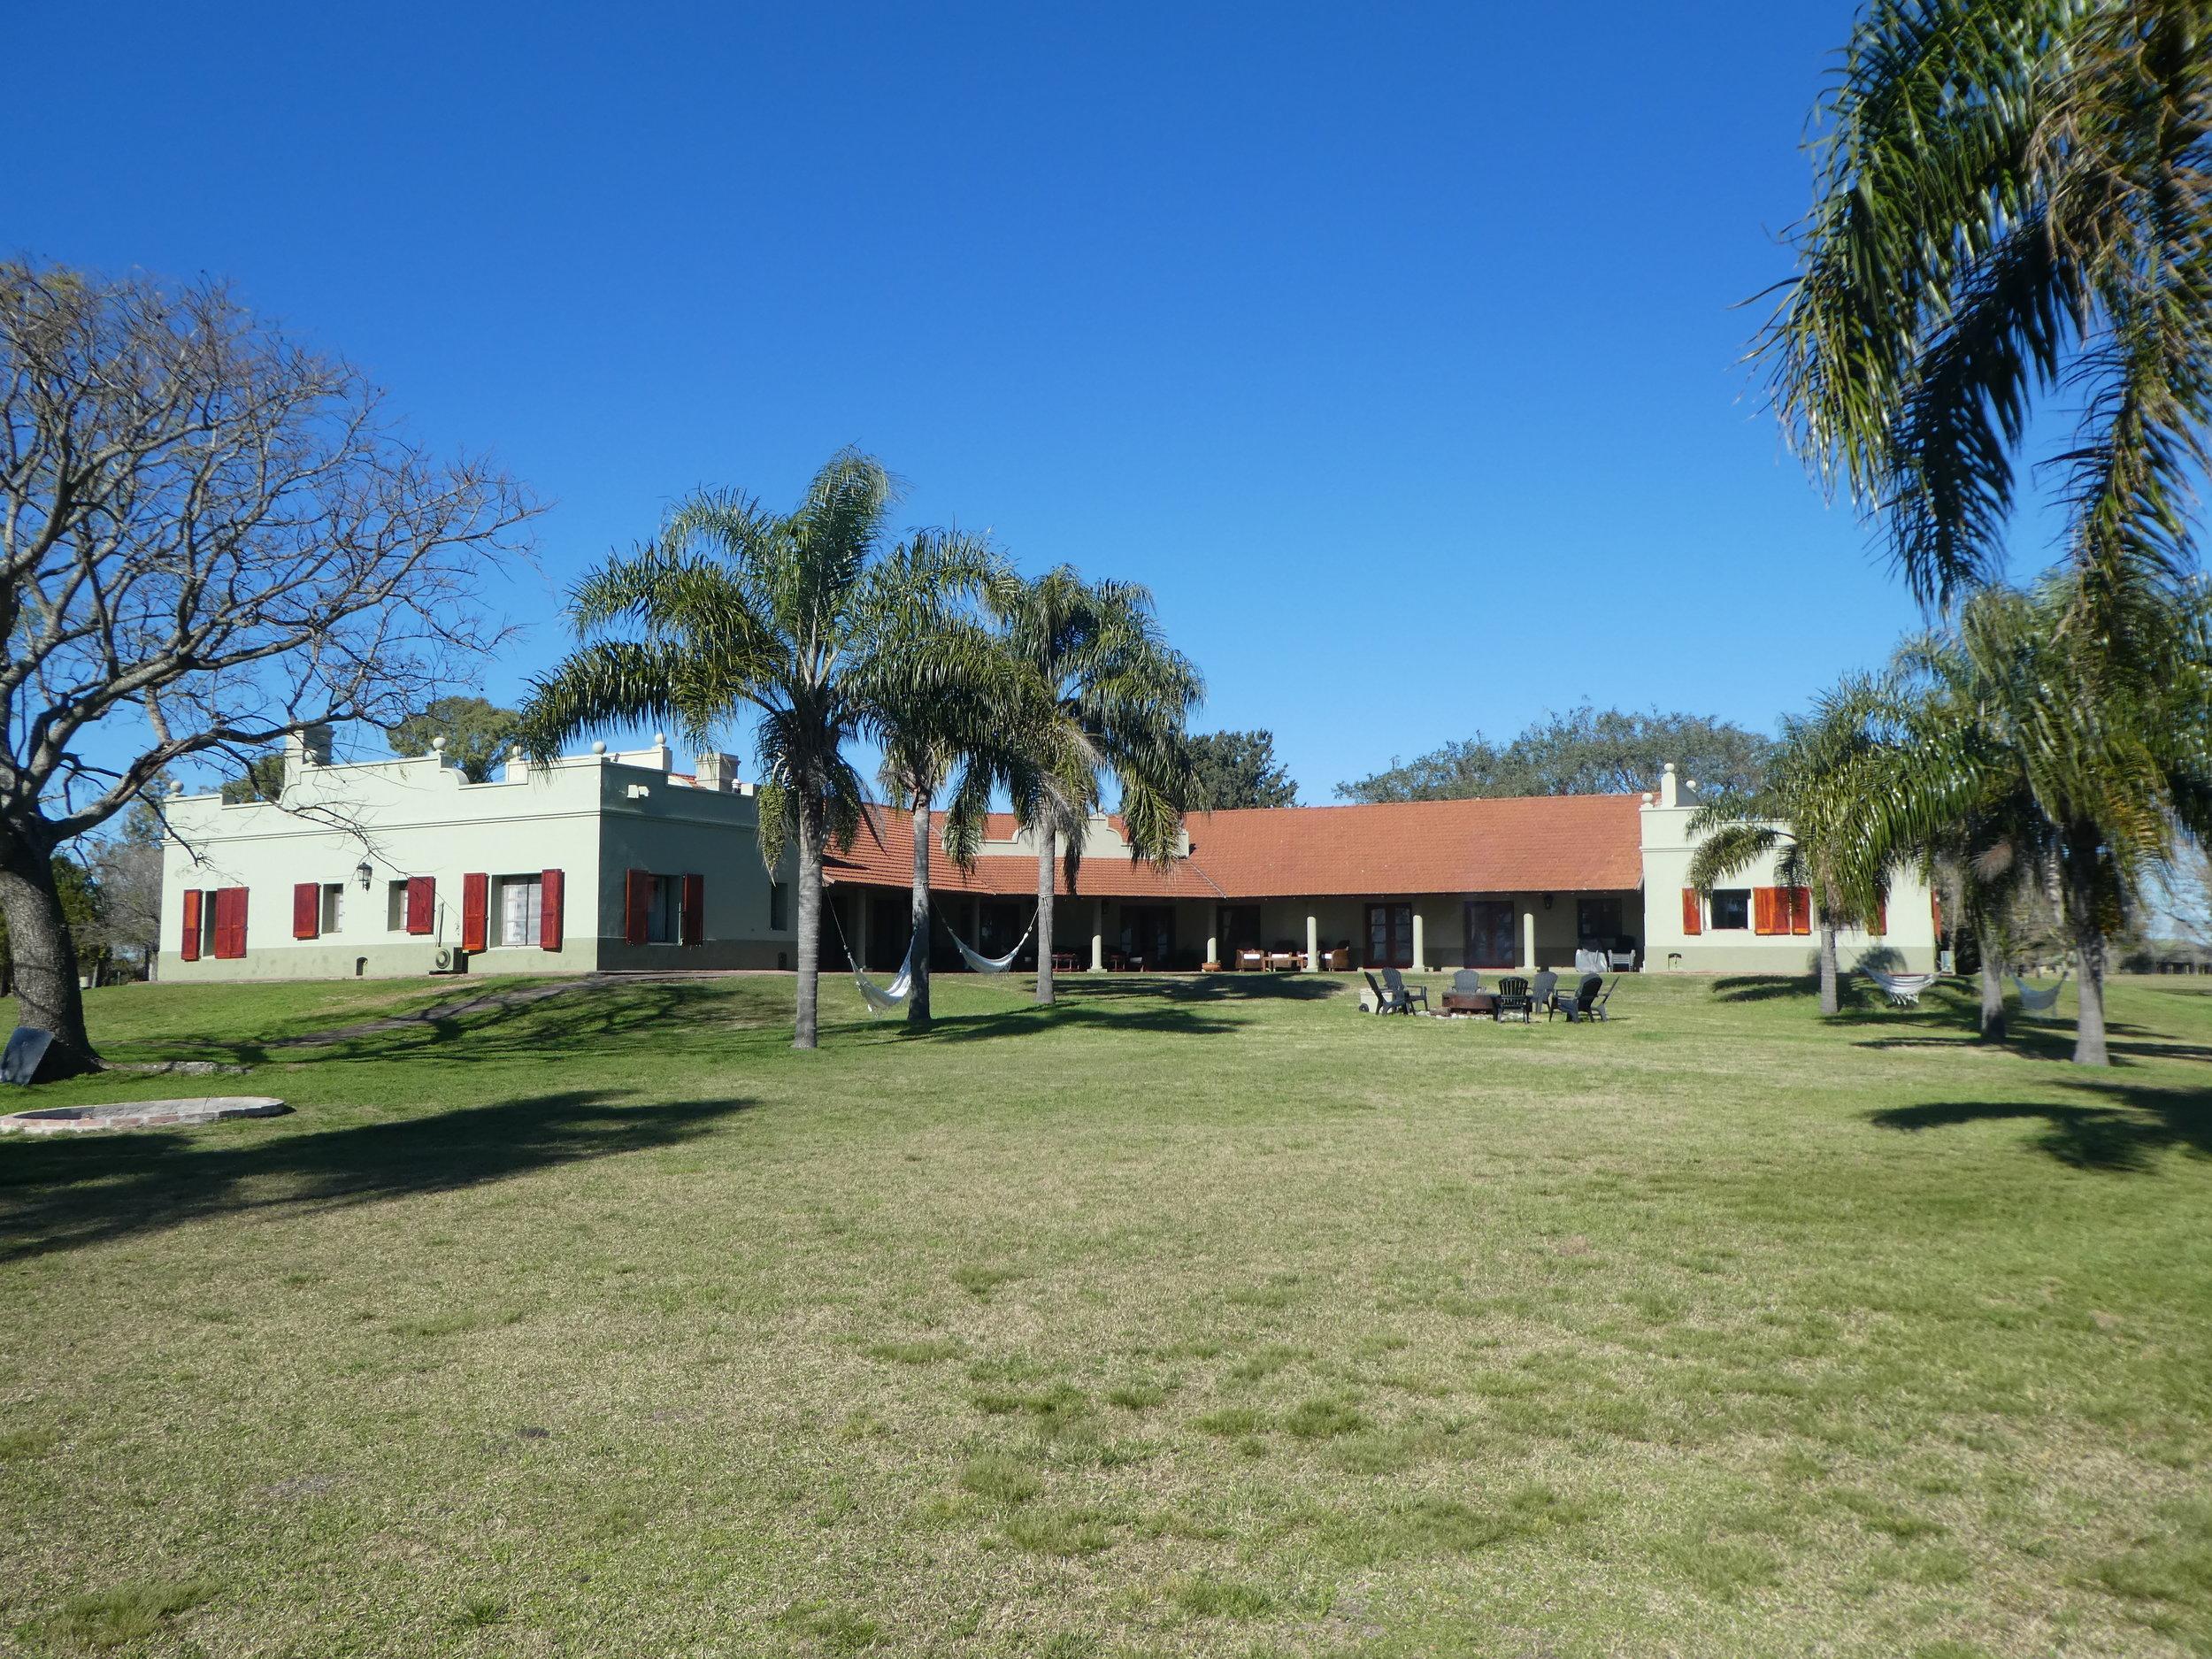 The lodge at Los Laureles in Entre Rios Province.